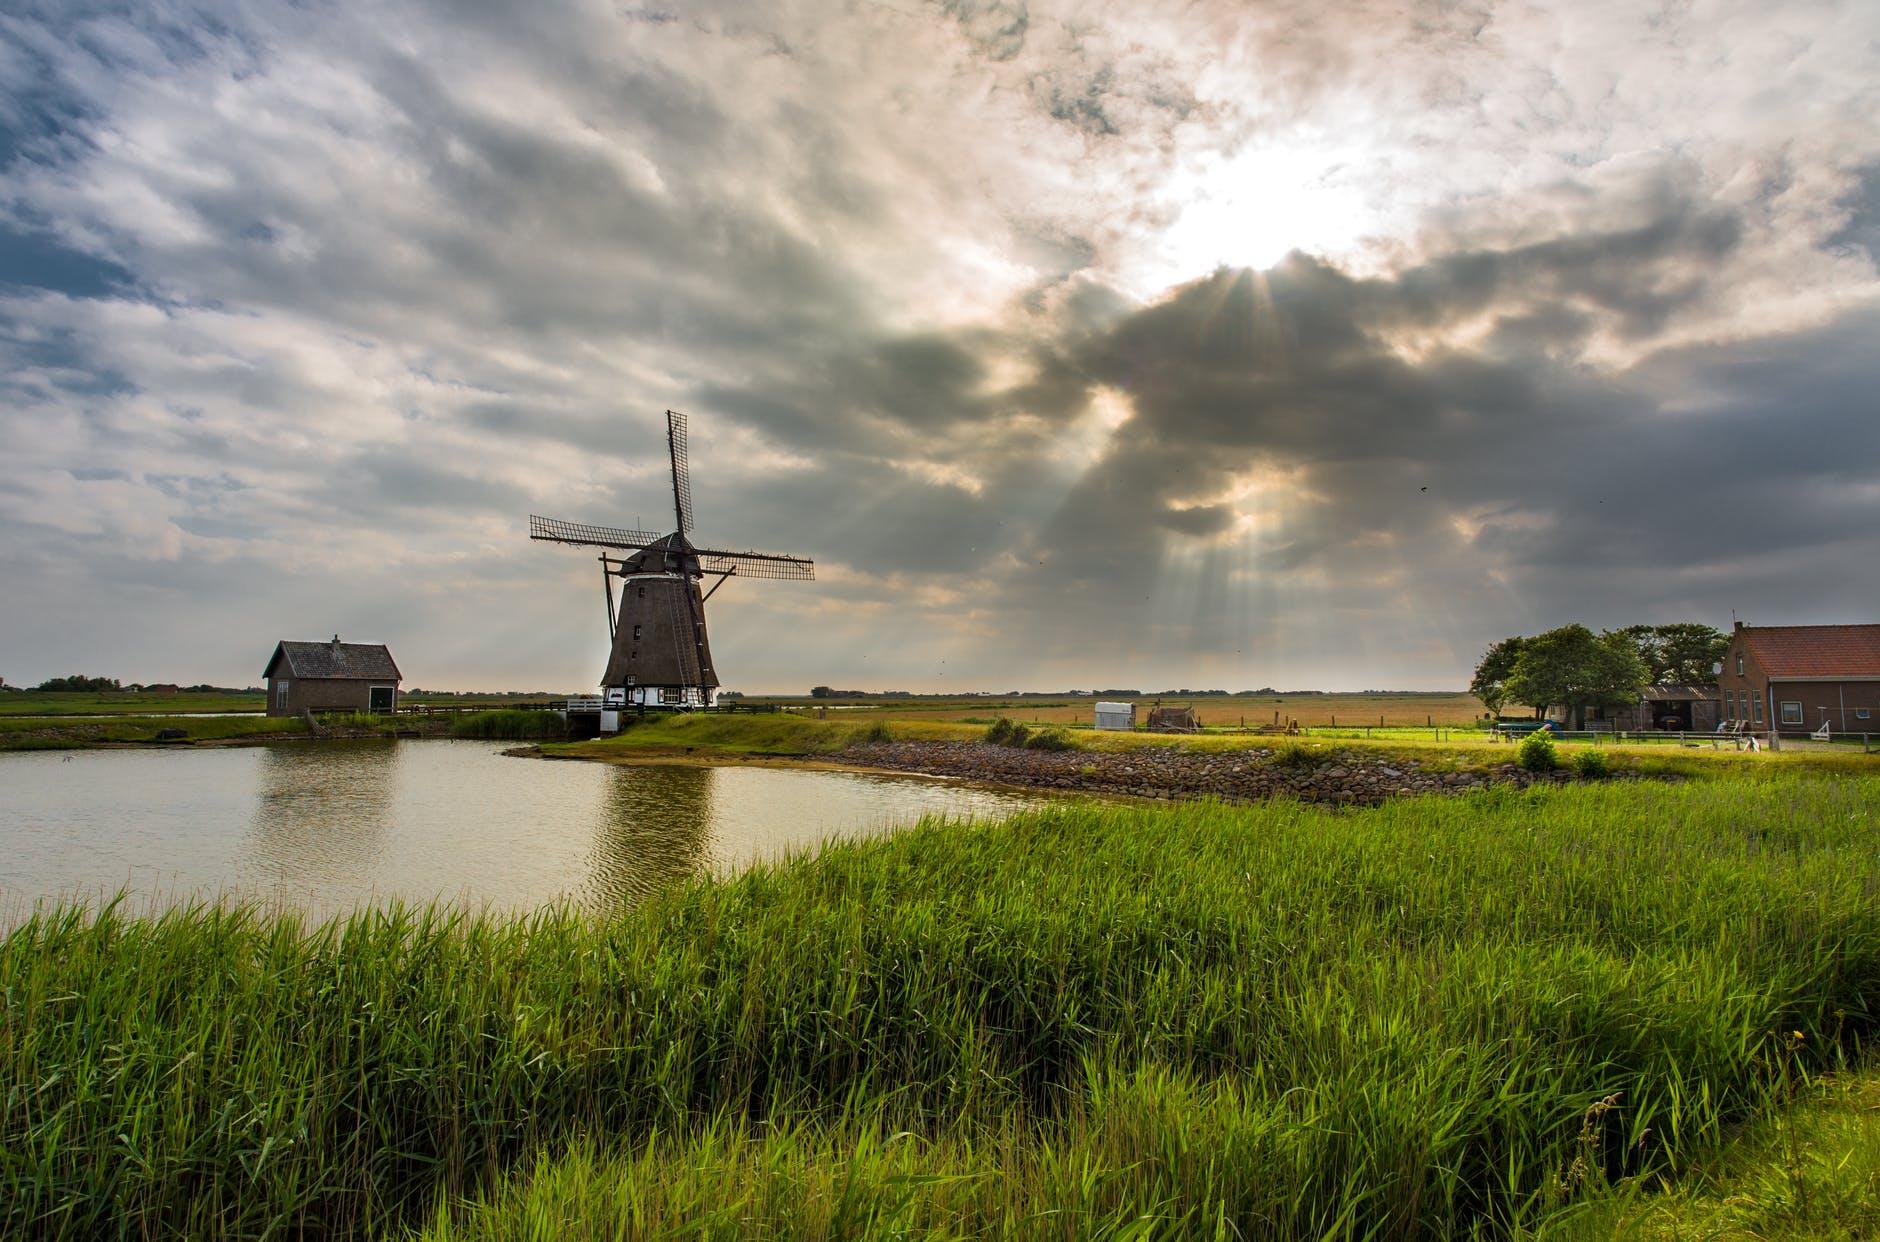 windmills and grass